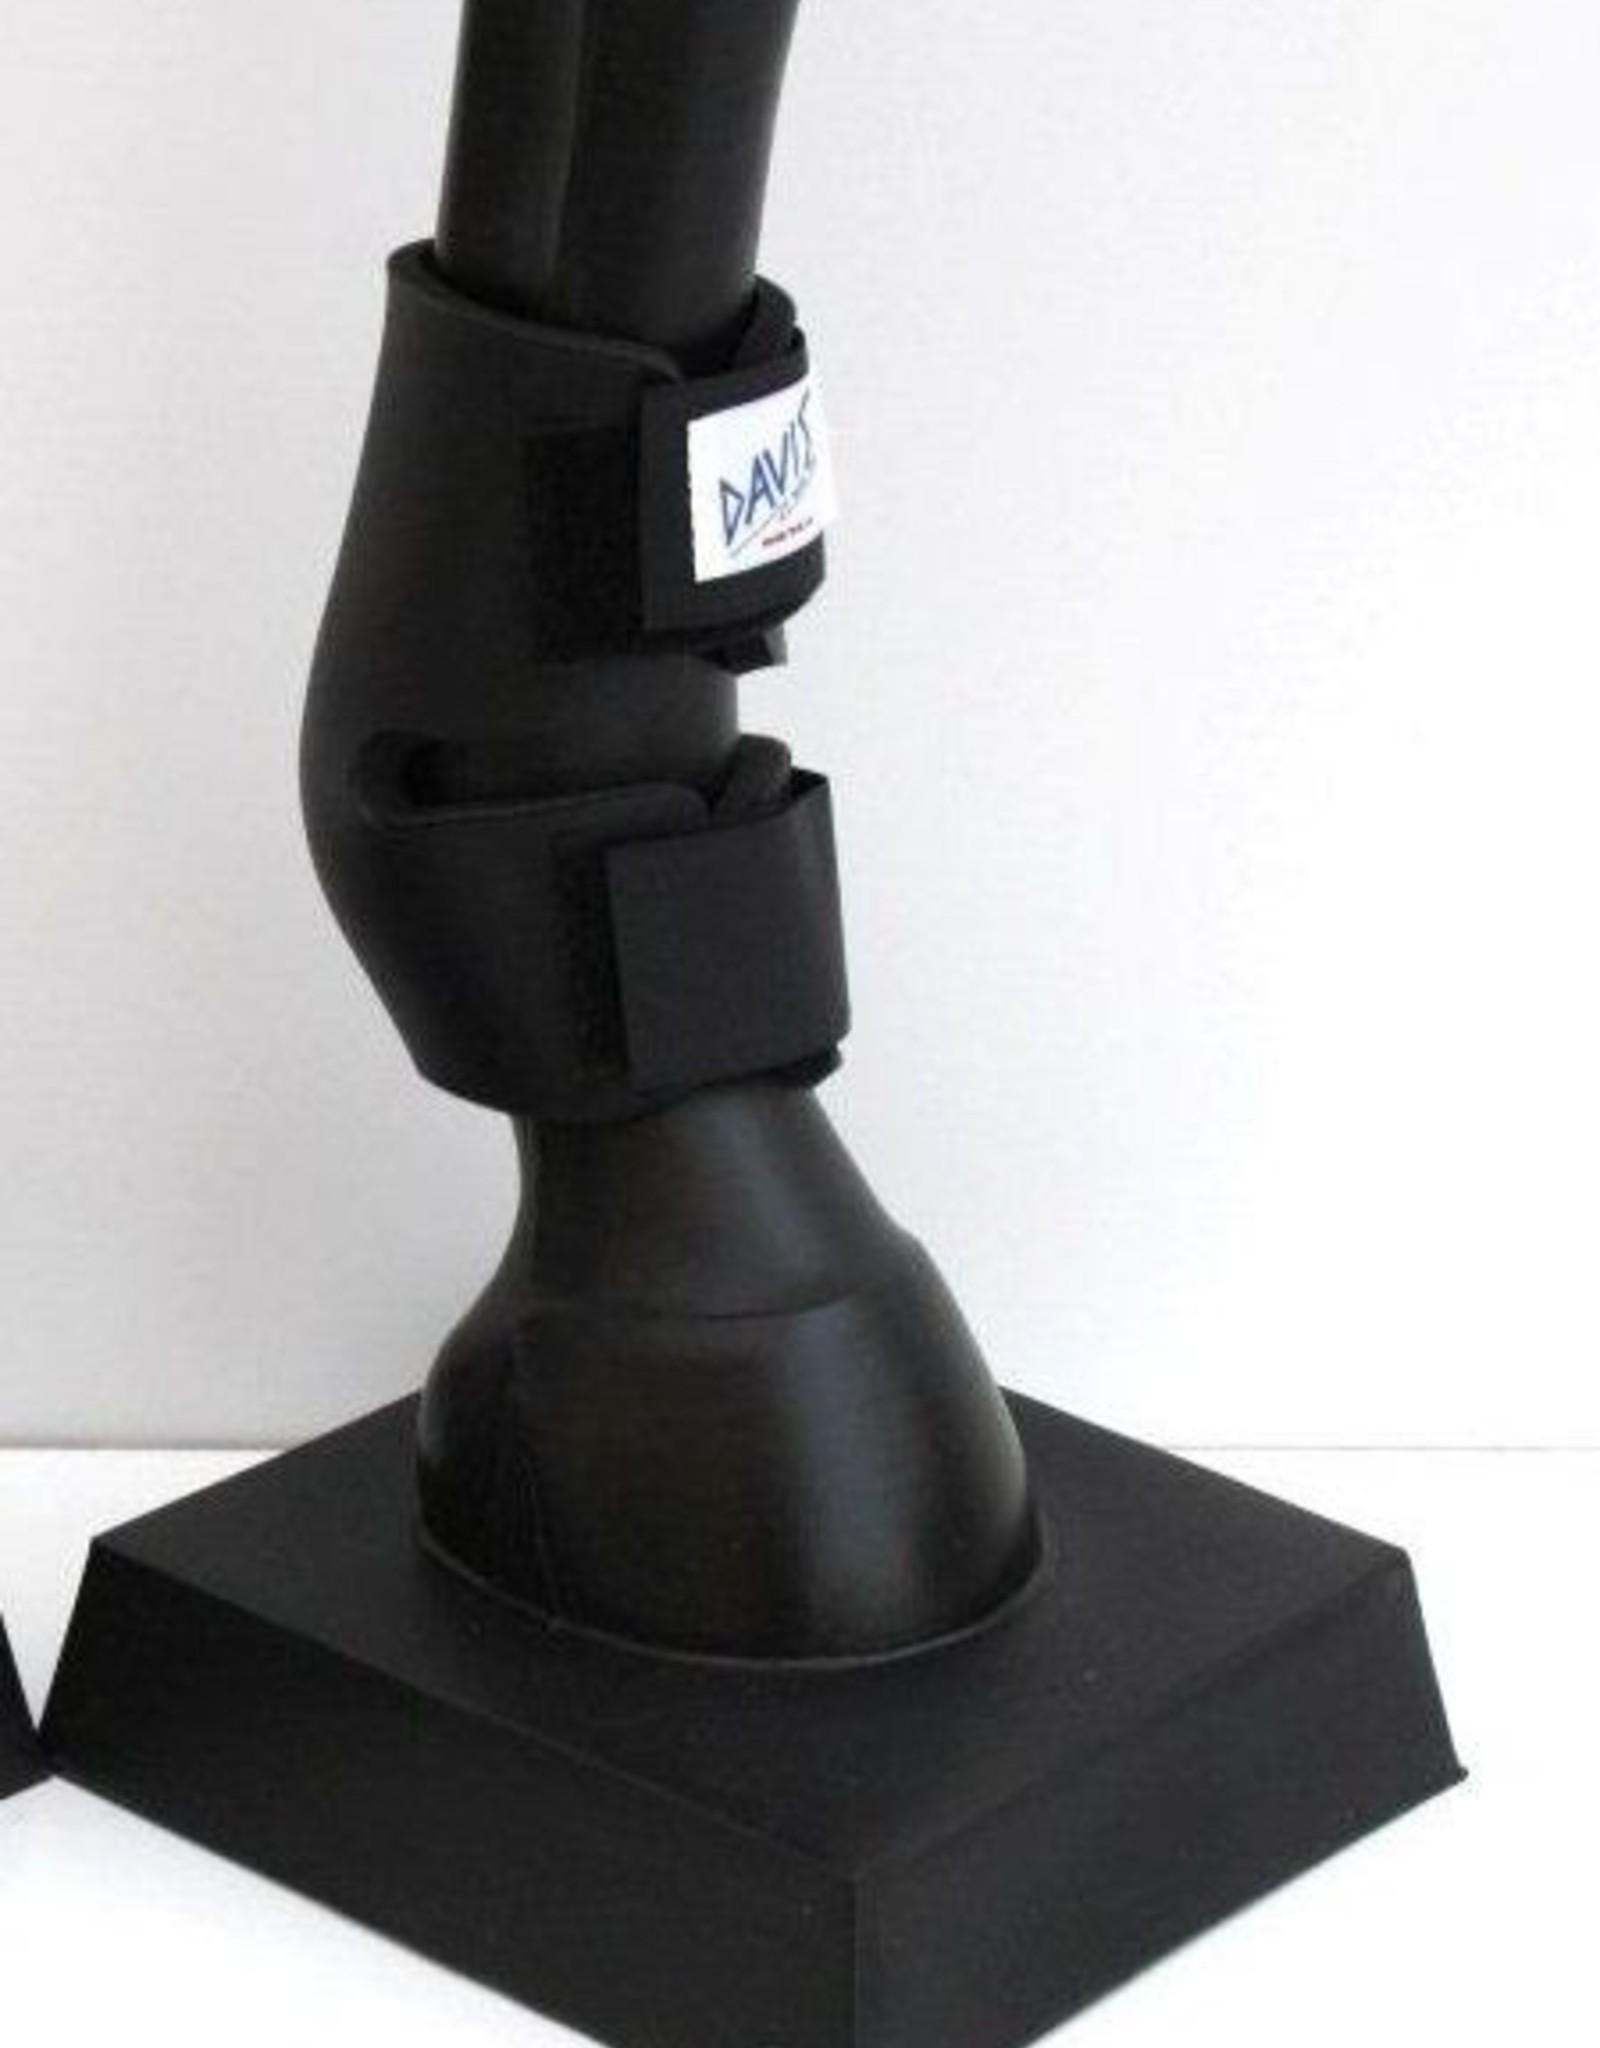 Davis Skid Boots Black Medium